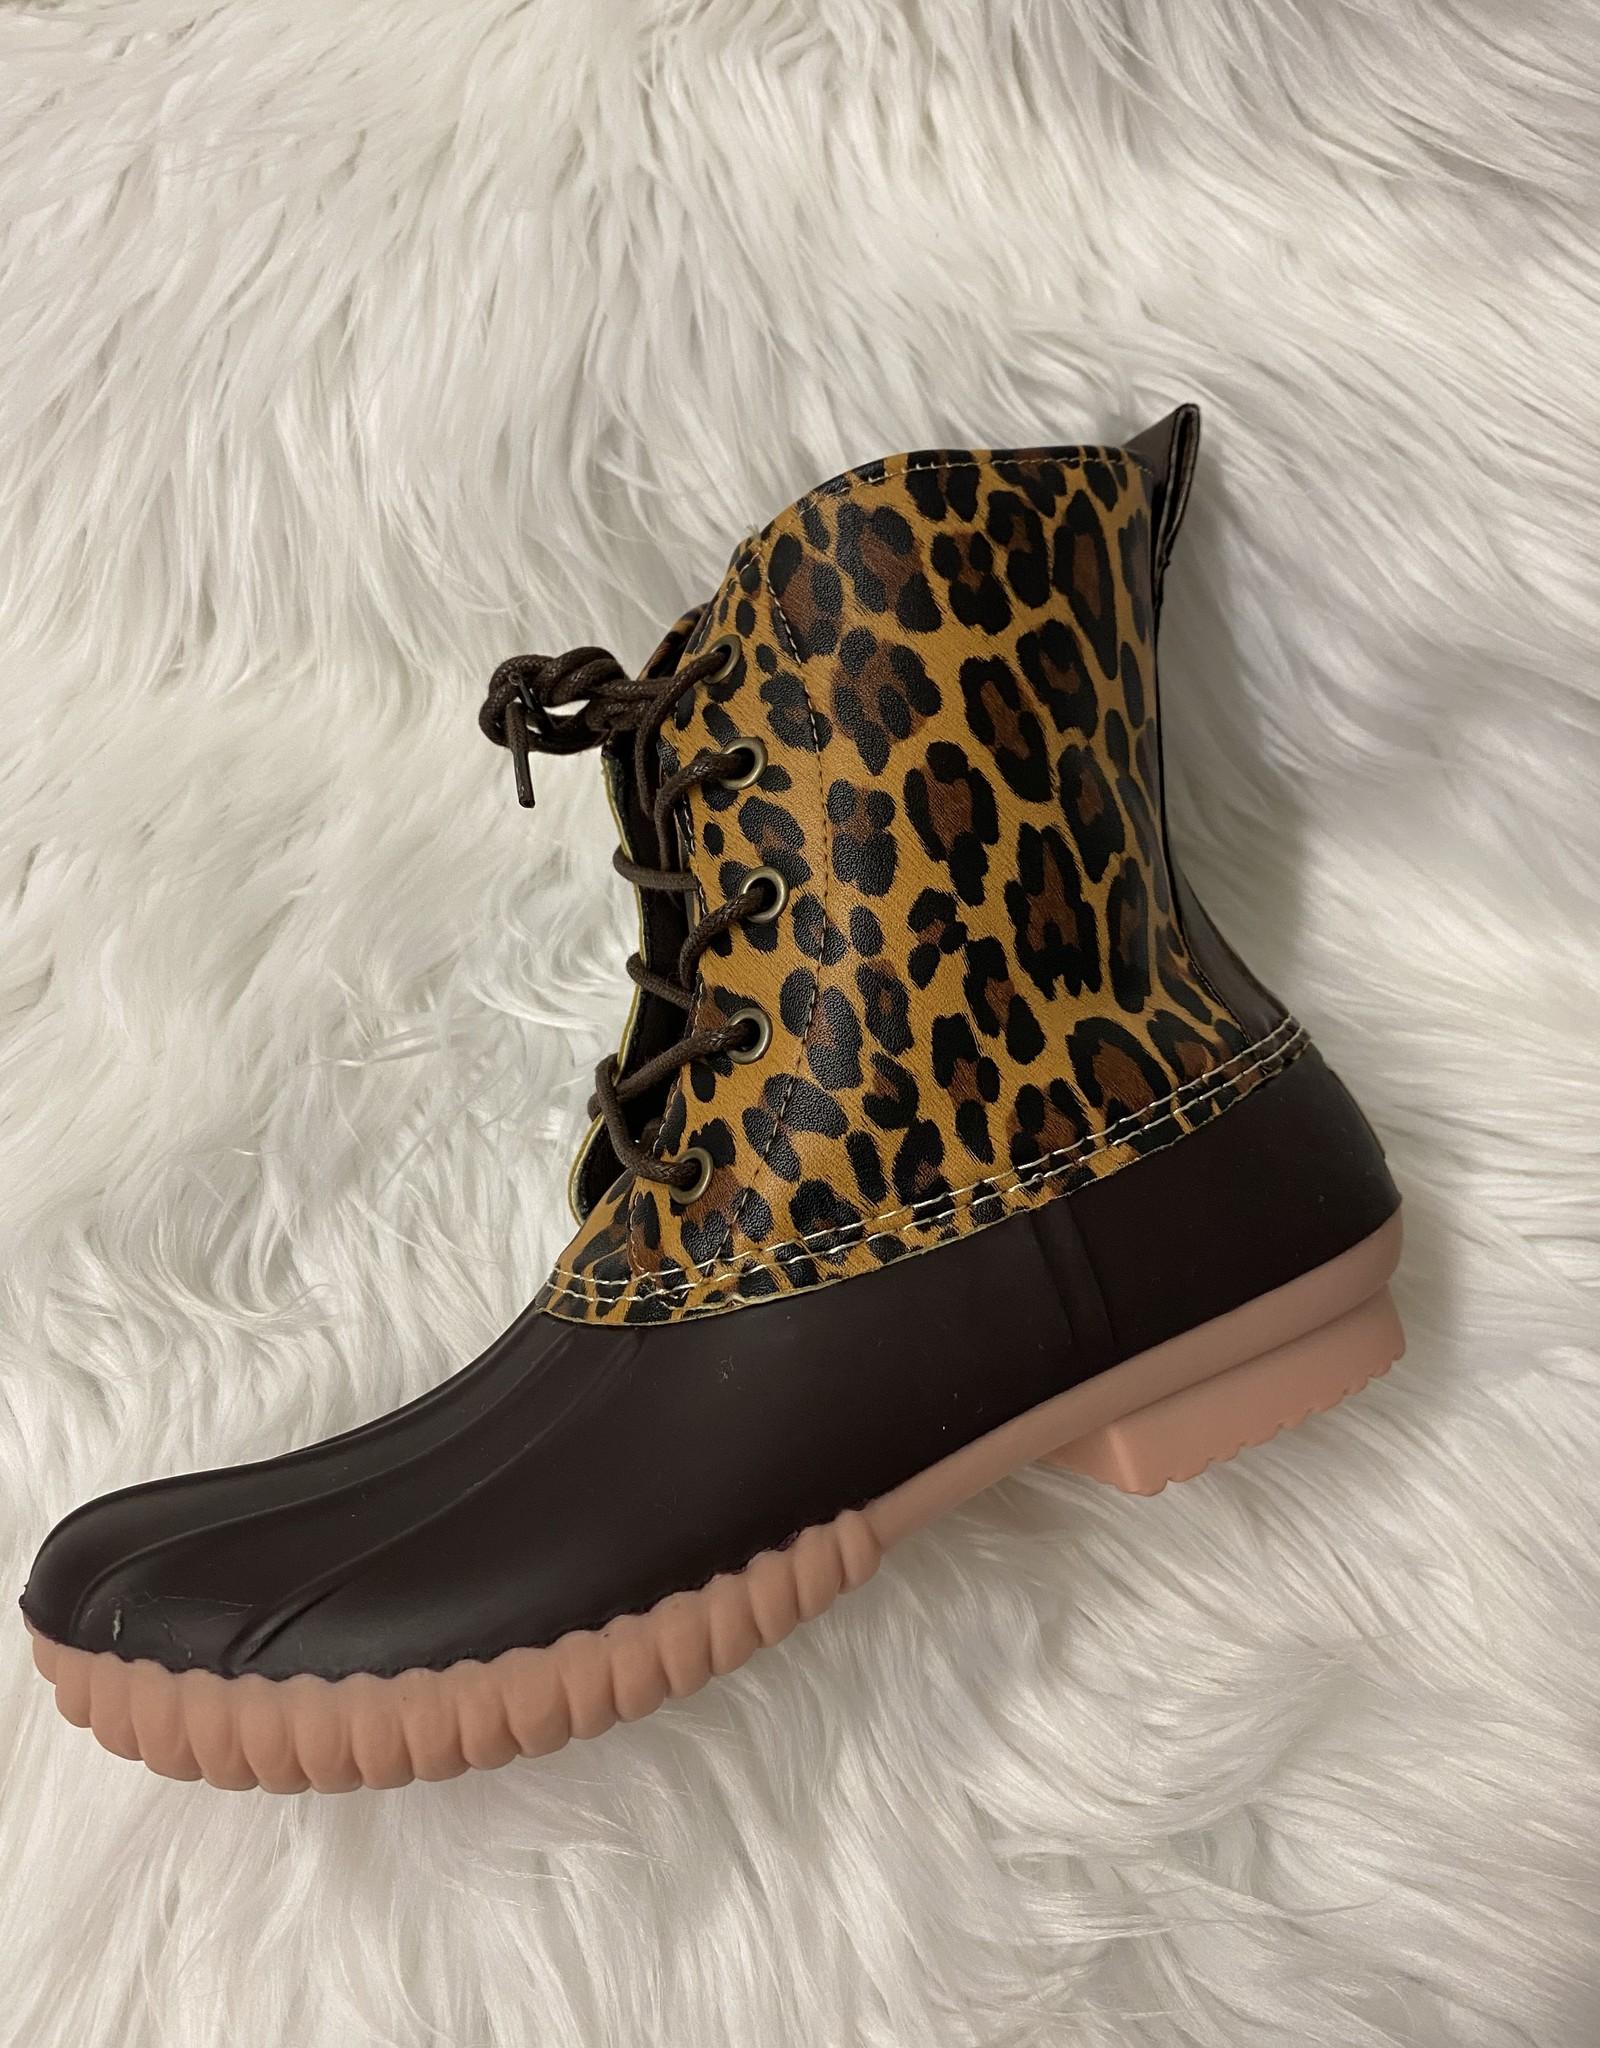 SASS Boutique Exclusive Leopard Tie Rainboot